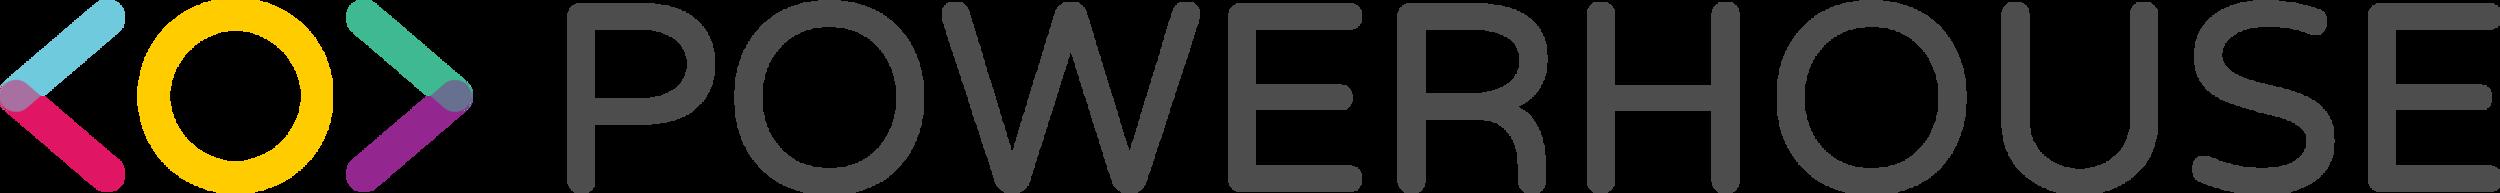 Powerhouse Ventures | Powerhouse